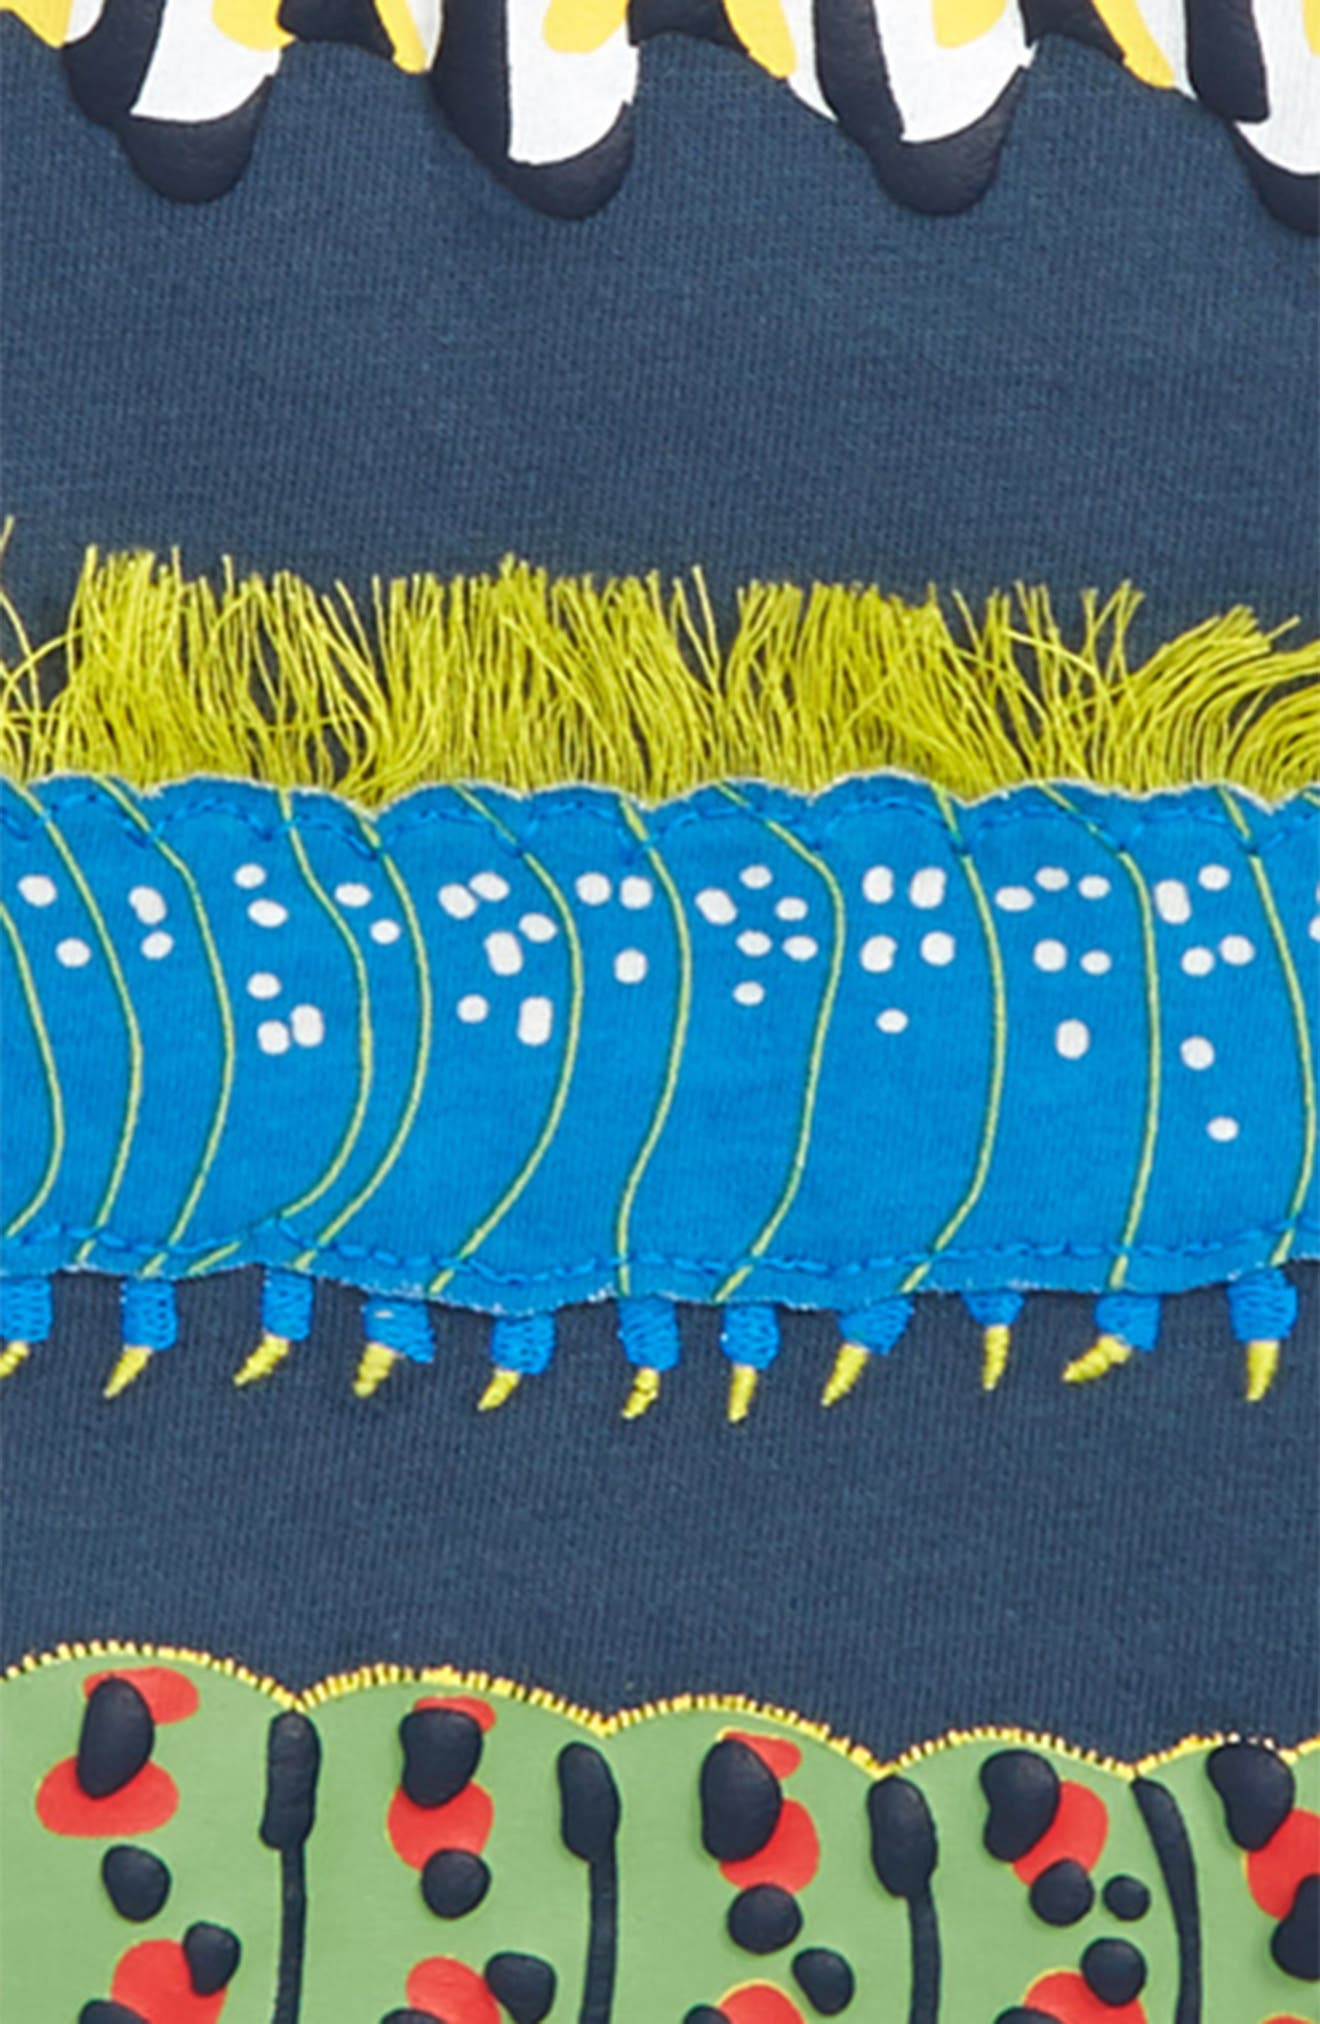 MINI BODEN,                             Creepy Crawly Caterpillars Layered T-Shirt,                             Alternate thumbnail 2, color,                             400